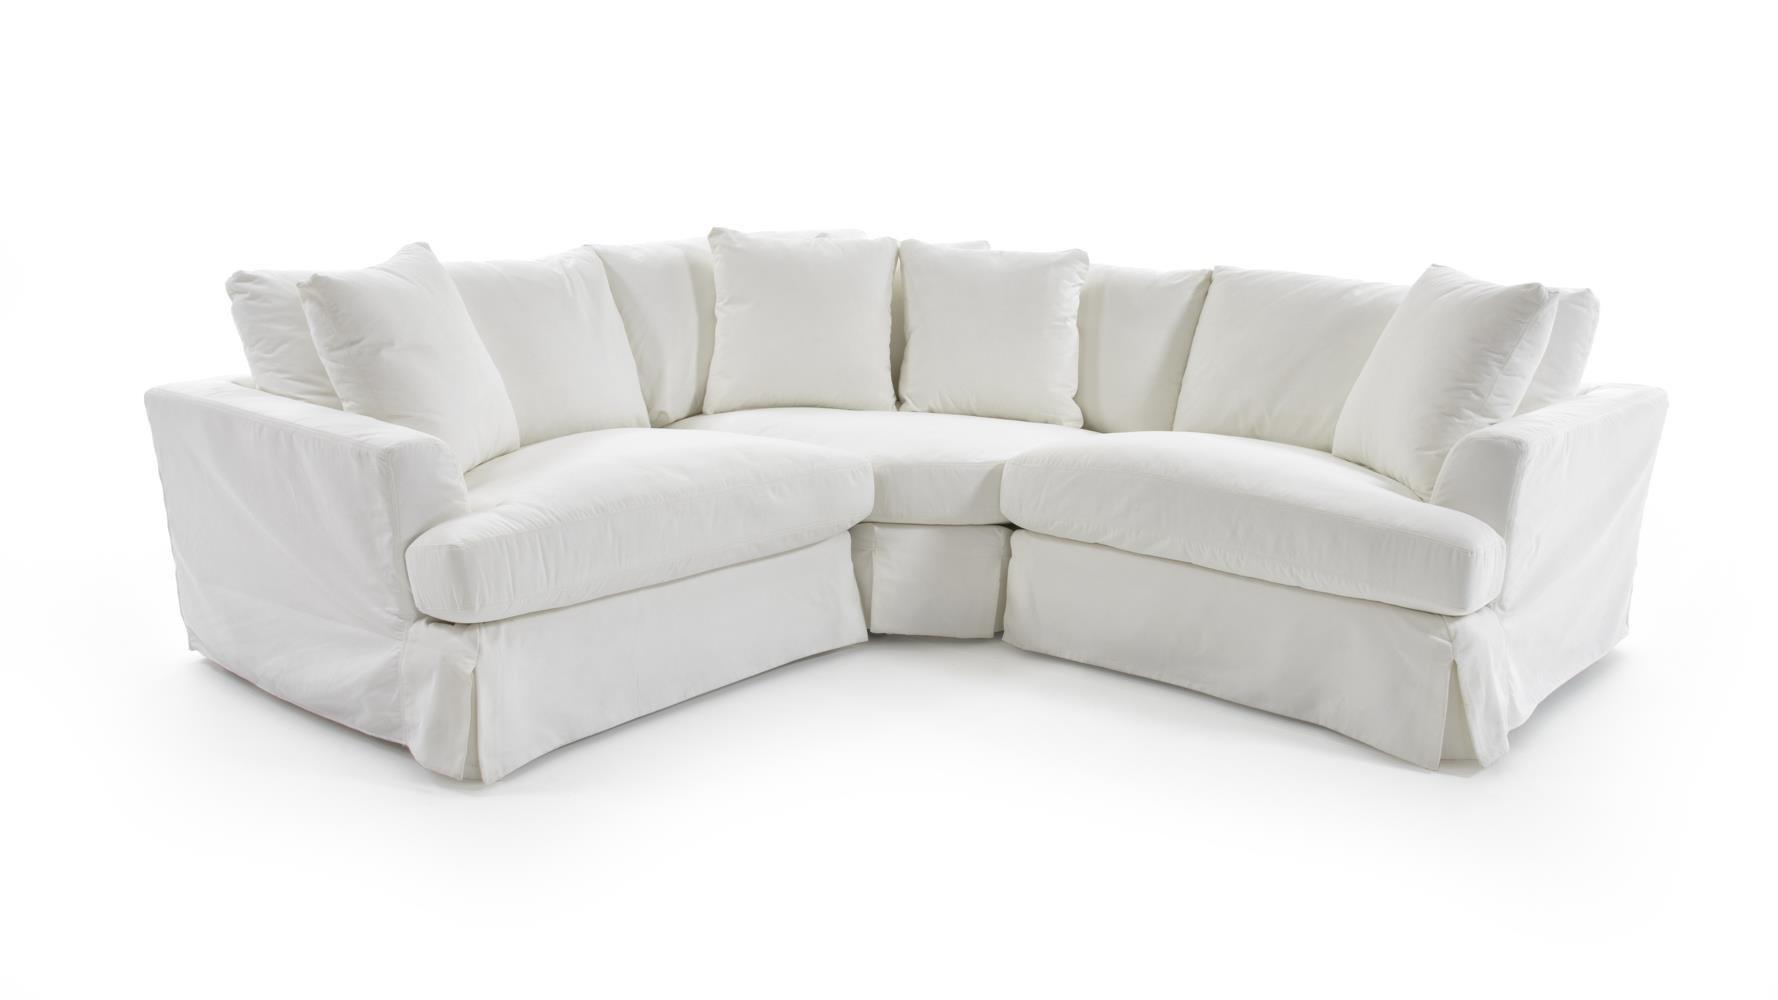 Synergy Home Furnishings 13003 Pc Sectional Sofa ...